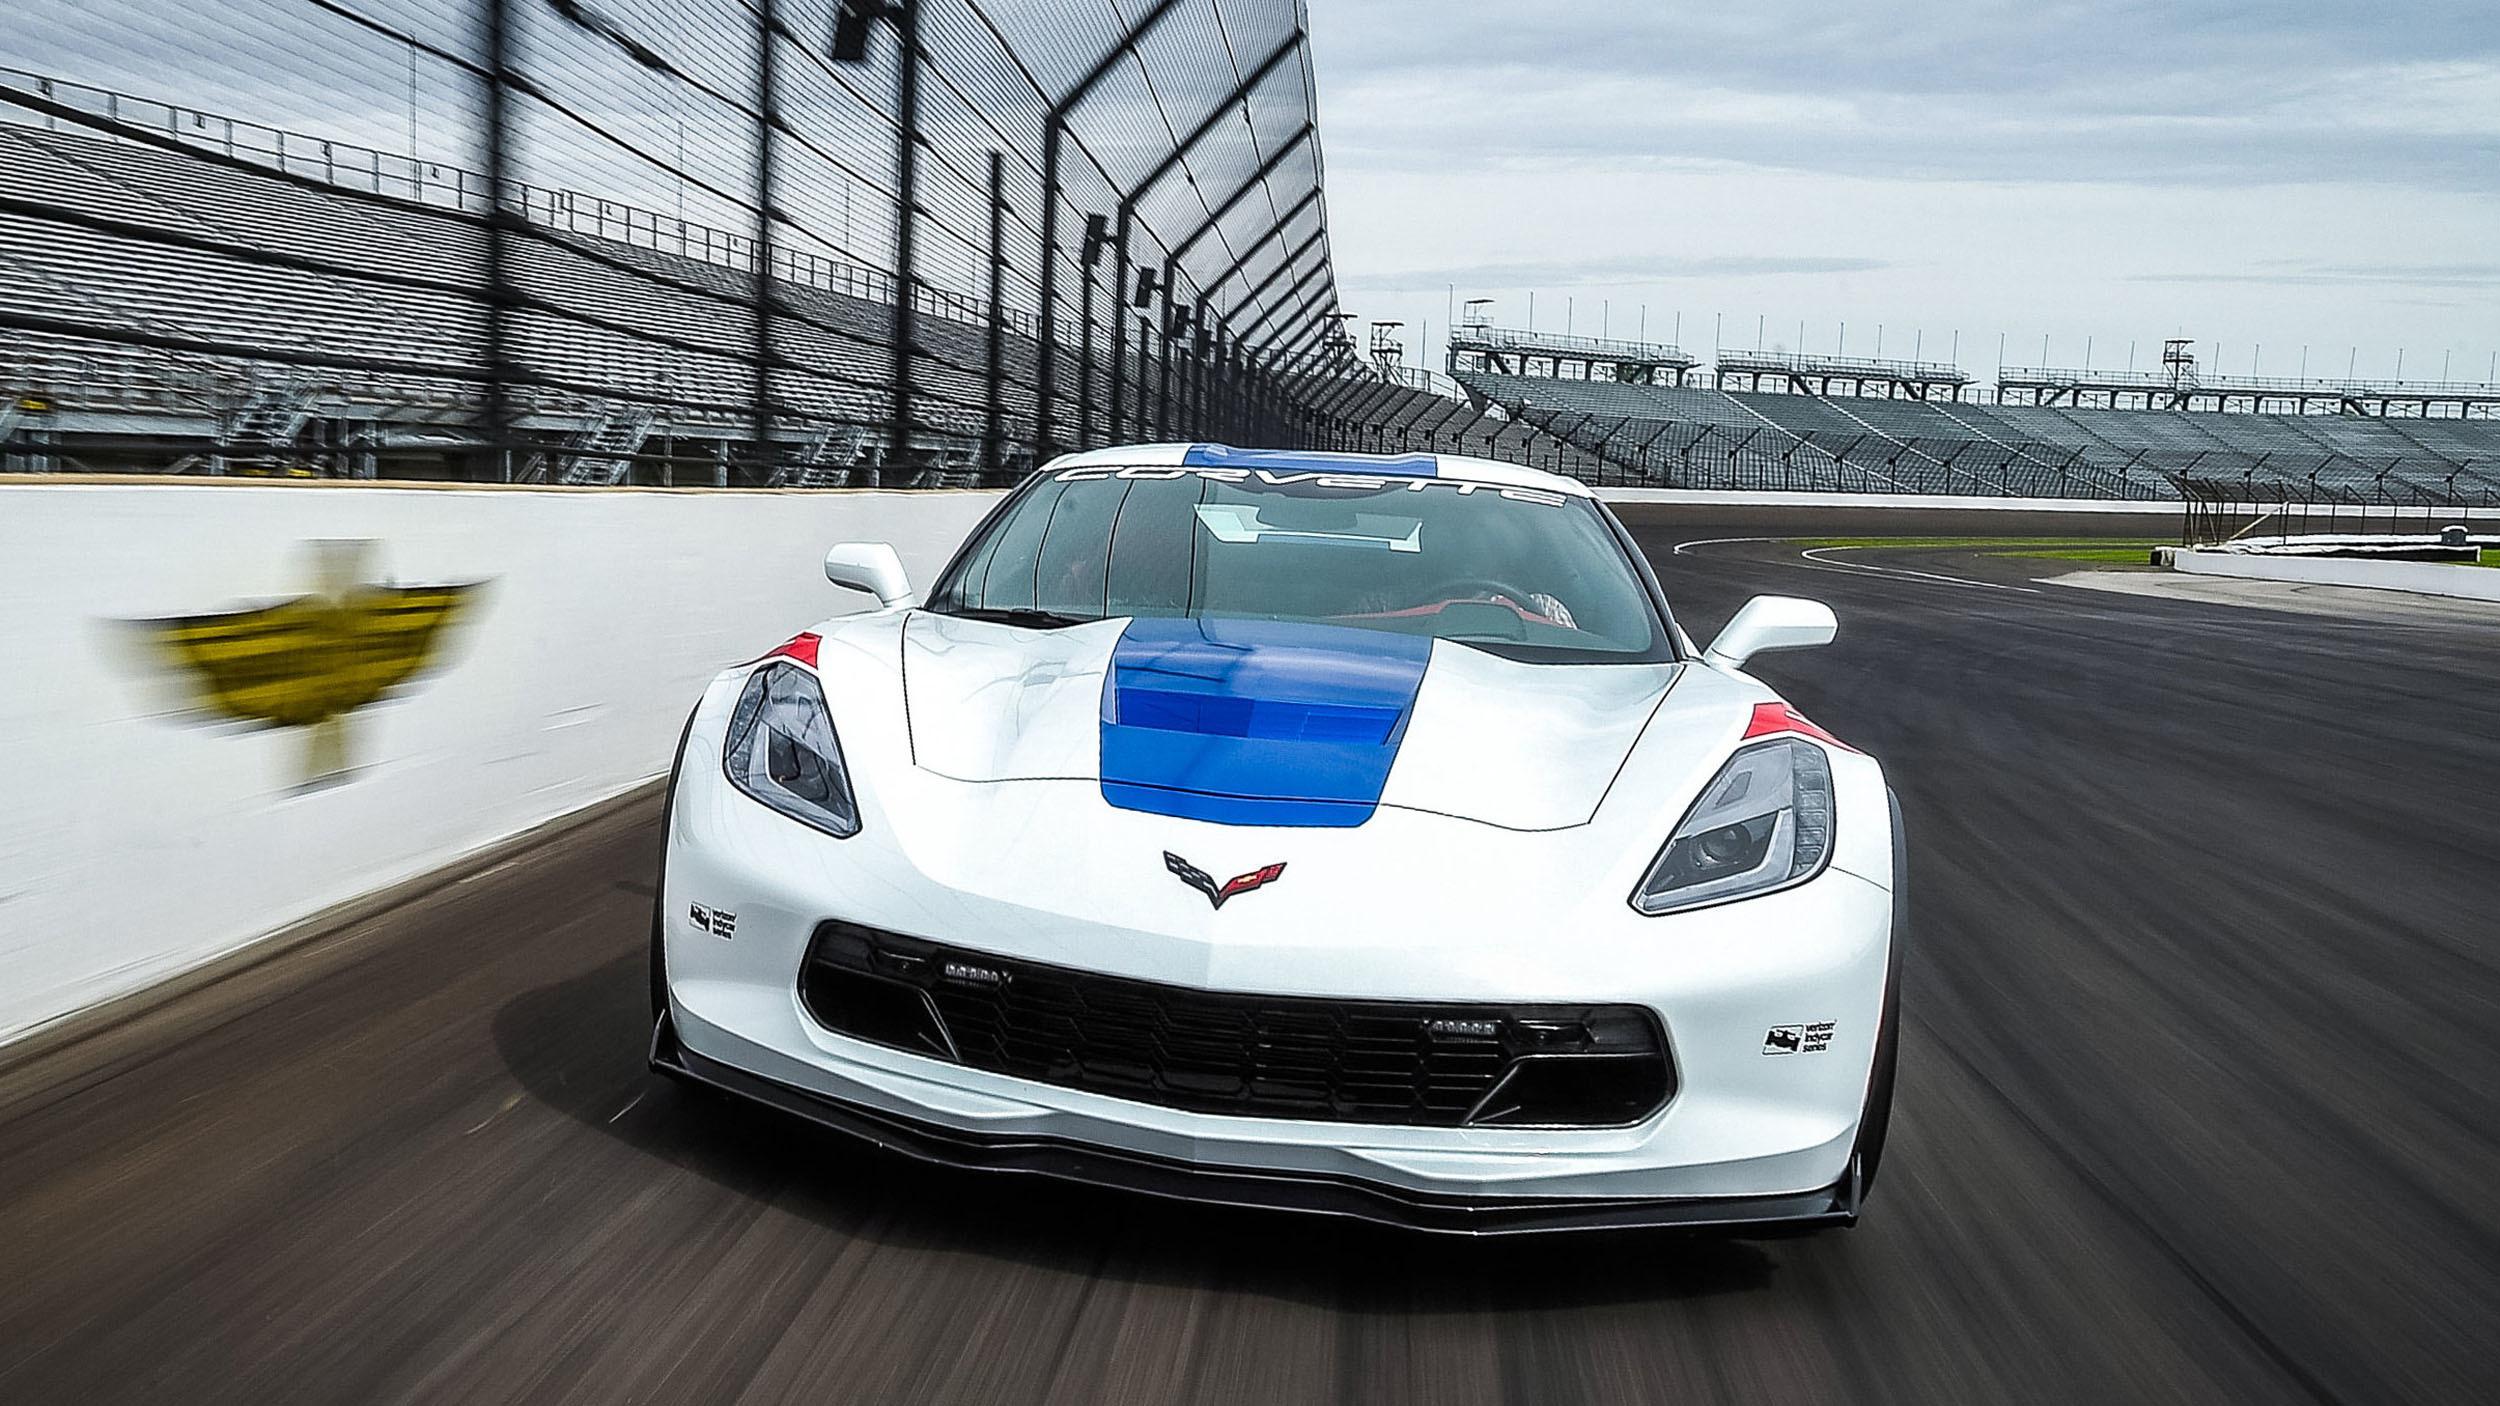 Chevrolet Corvette Grand Sport pace car Indy 500 (7)